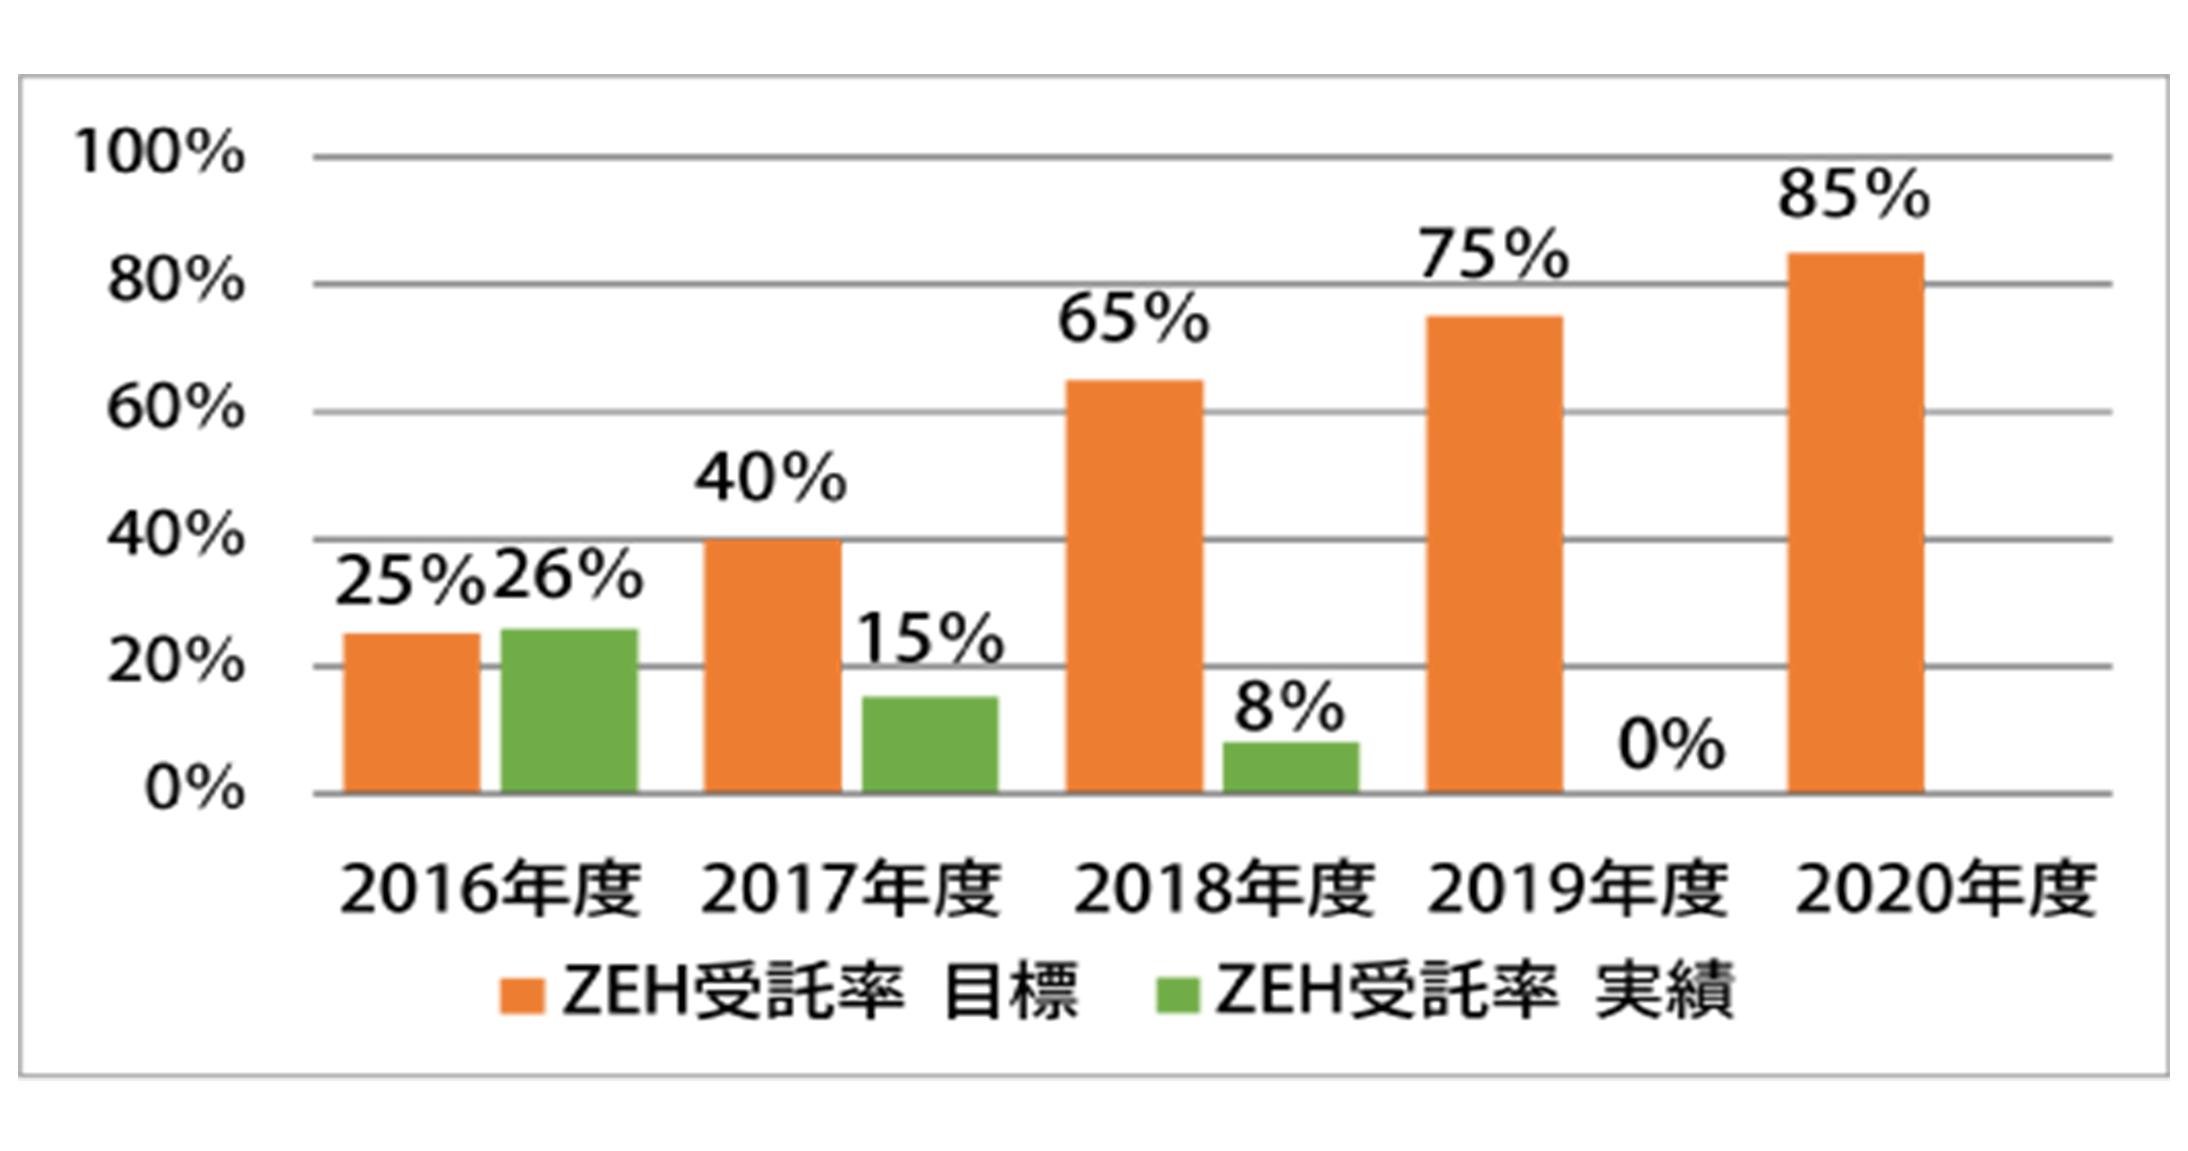 ZHE受諾率目標 棒グラフ